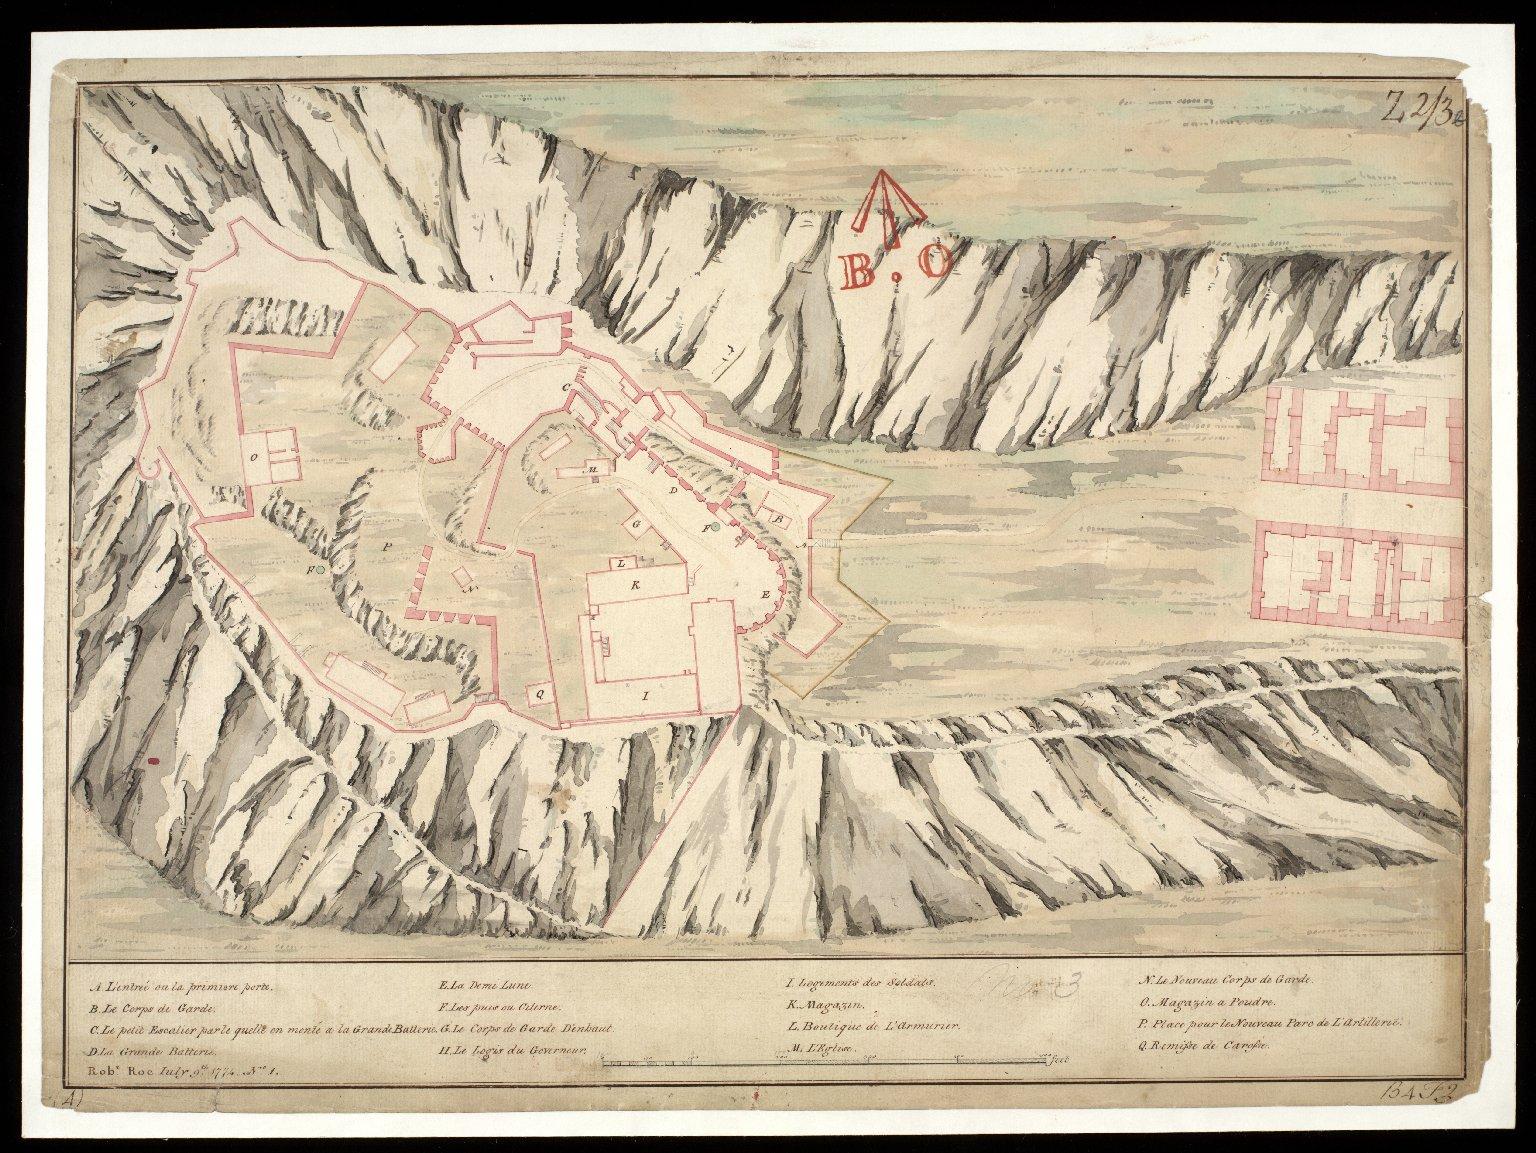 [Plan of Edinburgh Castle - copy; original 1725, copied 1774] [1 of 1]